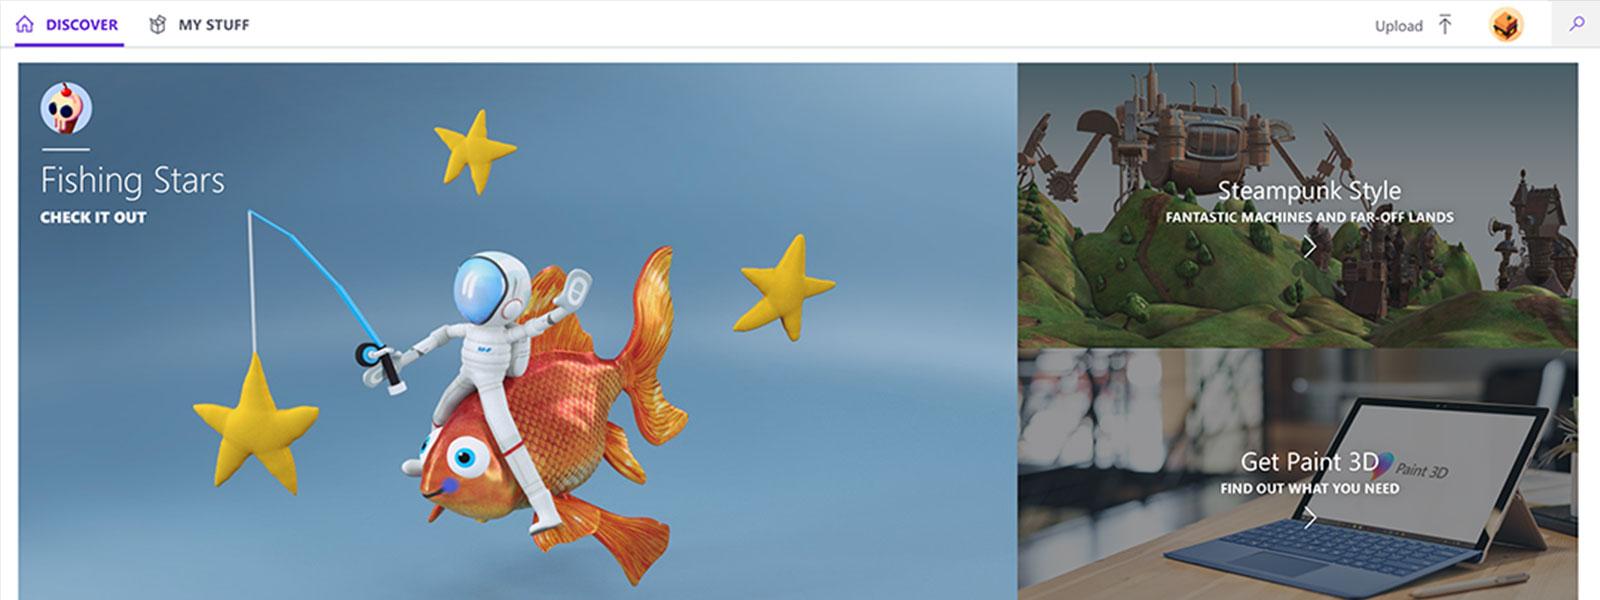 Imagen 3D de Windows Paint de pesca de estrellas